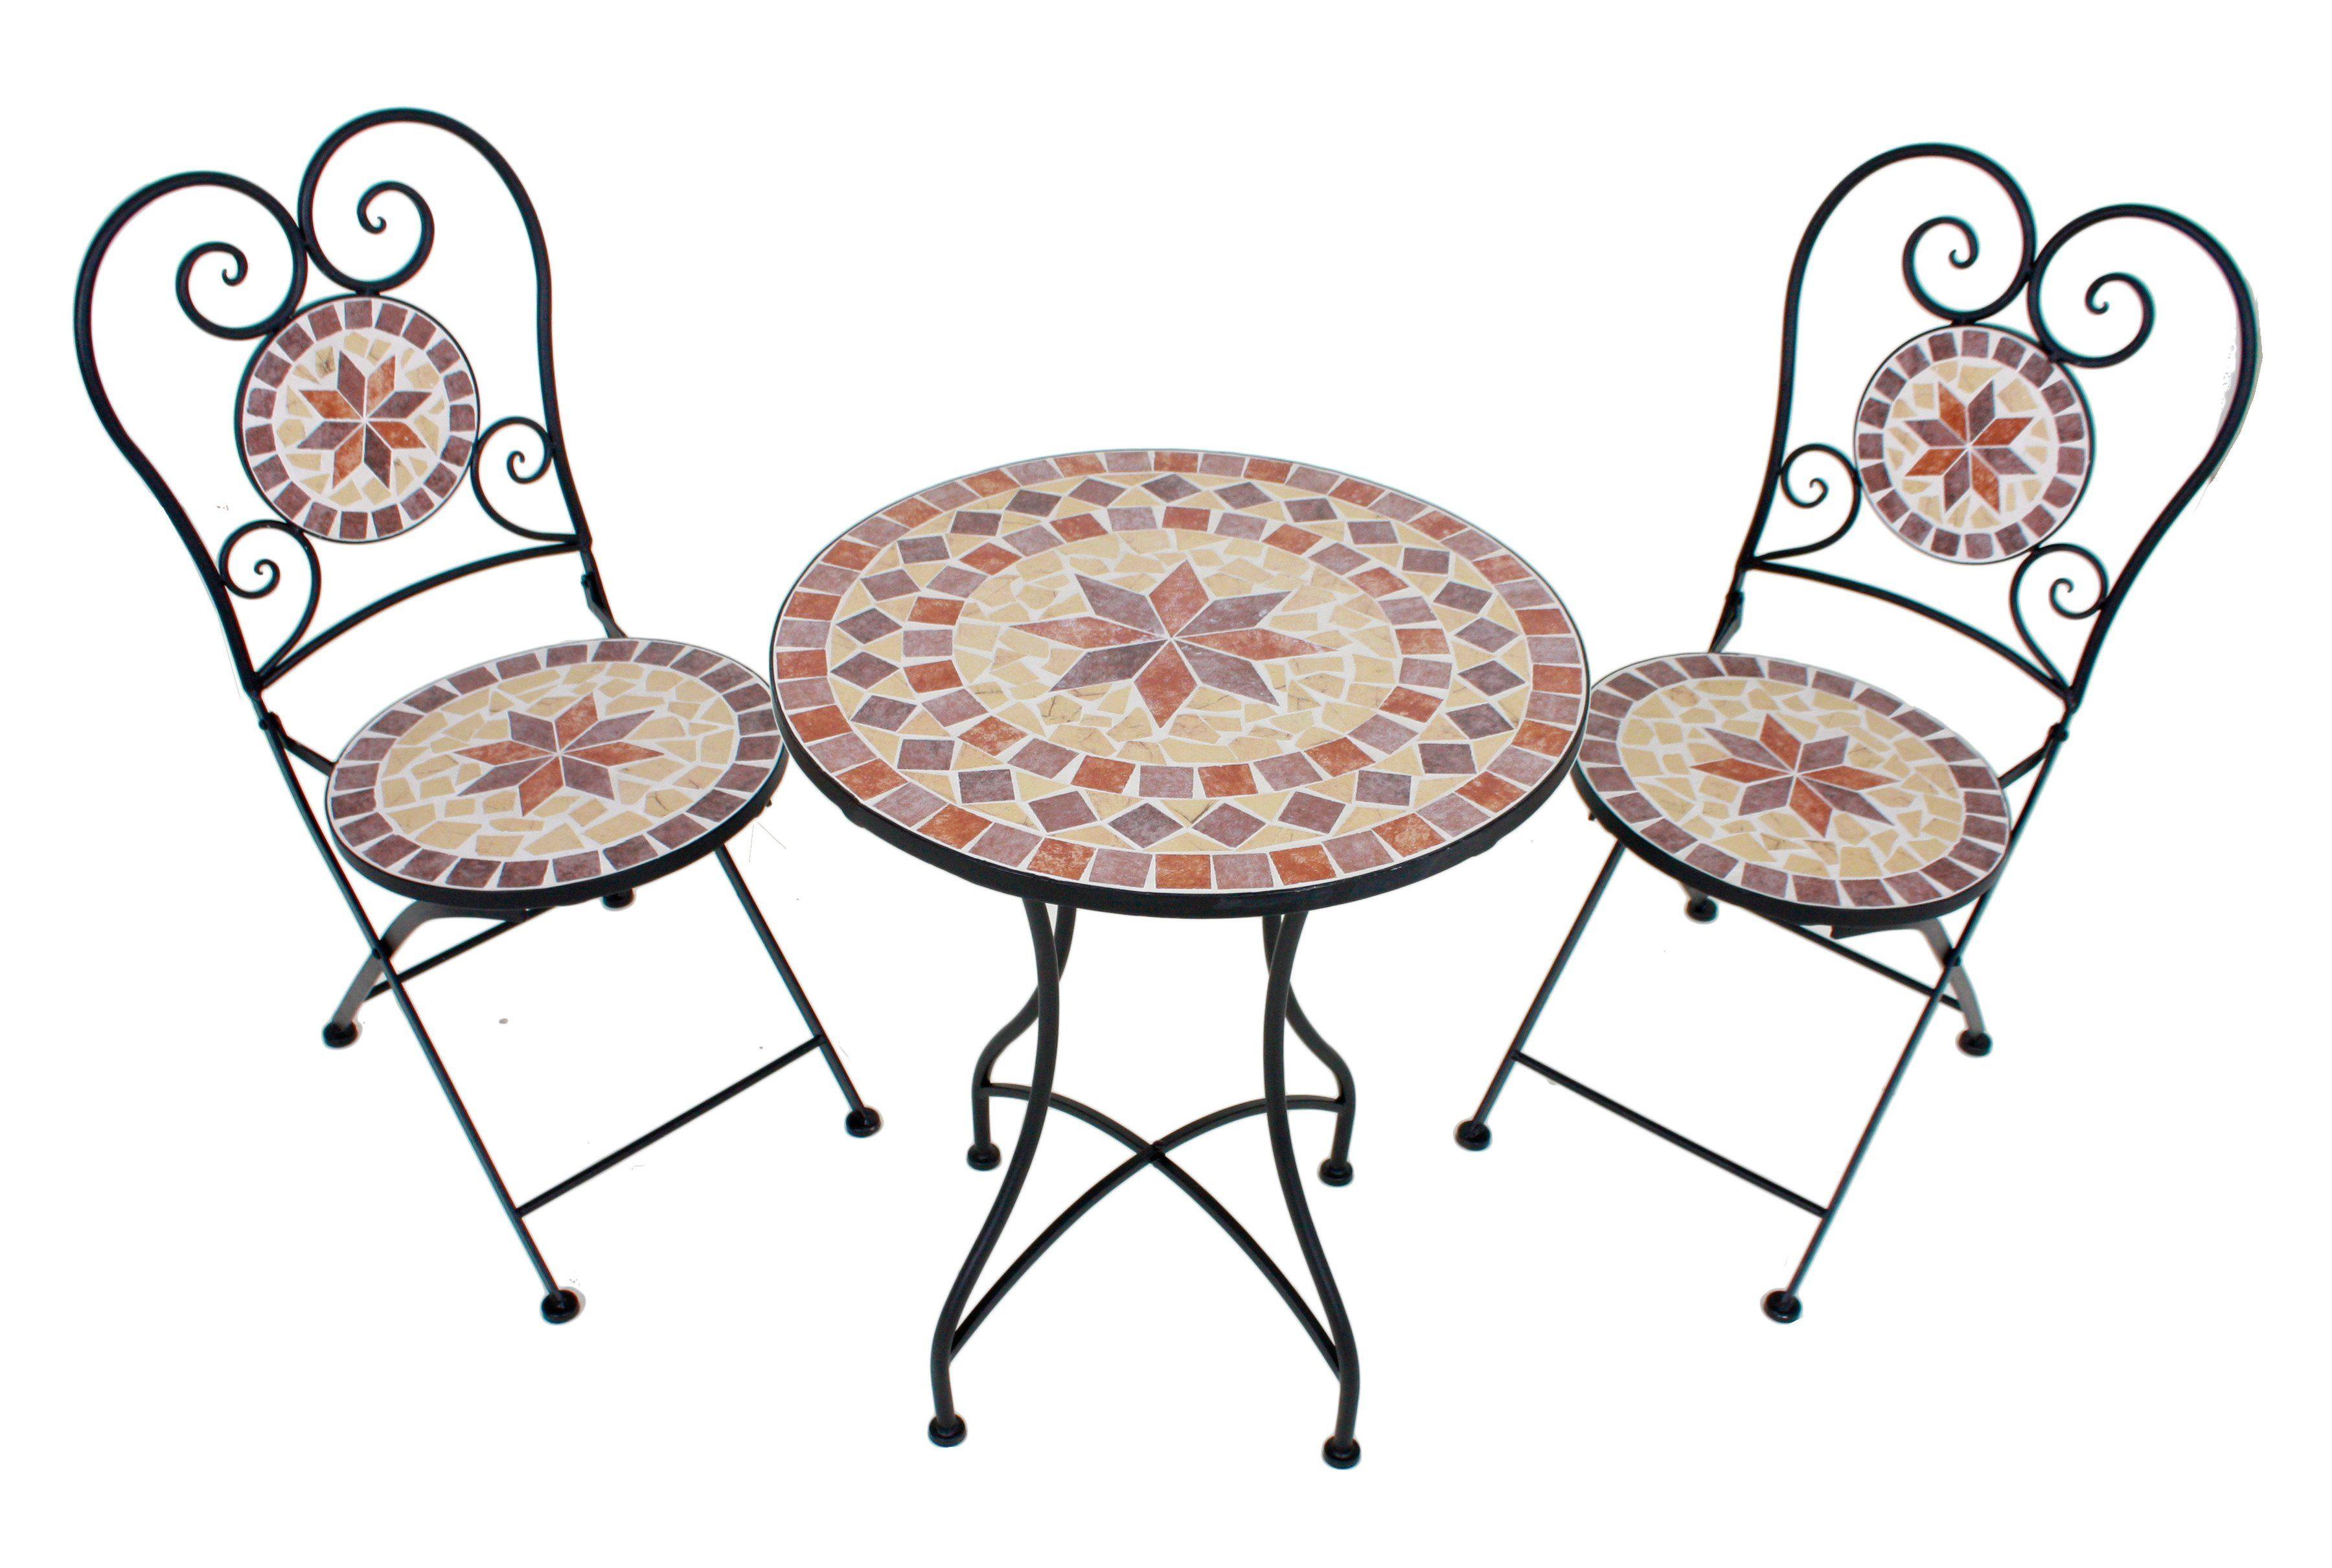 3-tlg. Gartenmöbelset »Mosaik«, 2 Stühle,Tisch Ø60 cm,Stahl, braun-grau